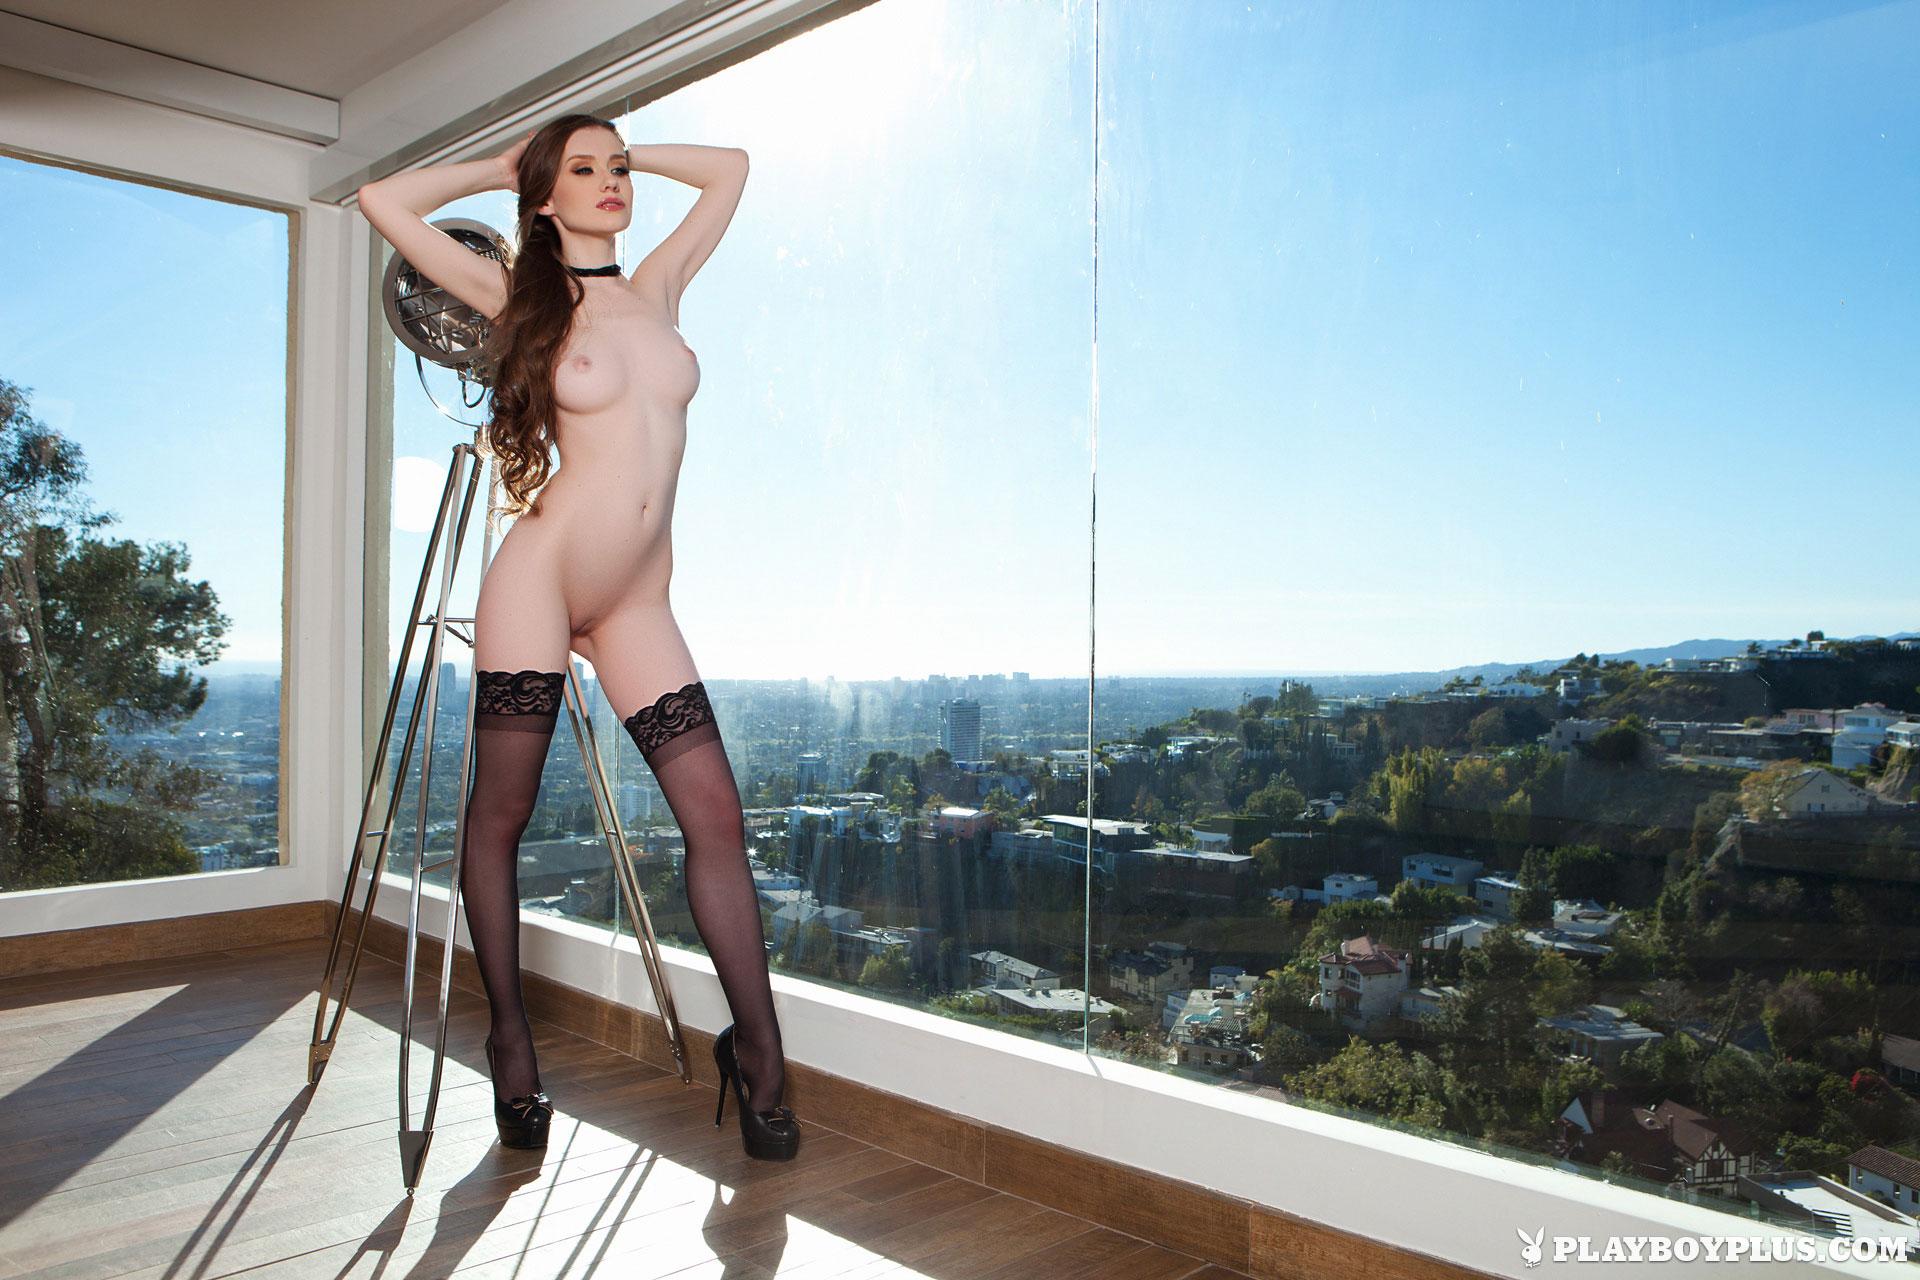 emily-bloom-sunny-apartment-stockings-playboy-18